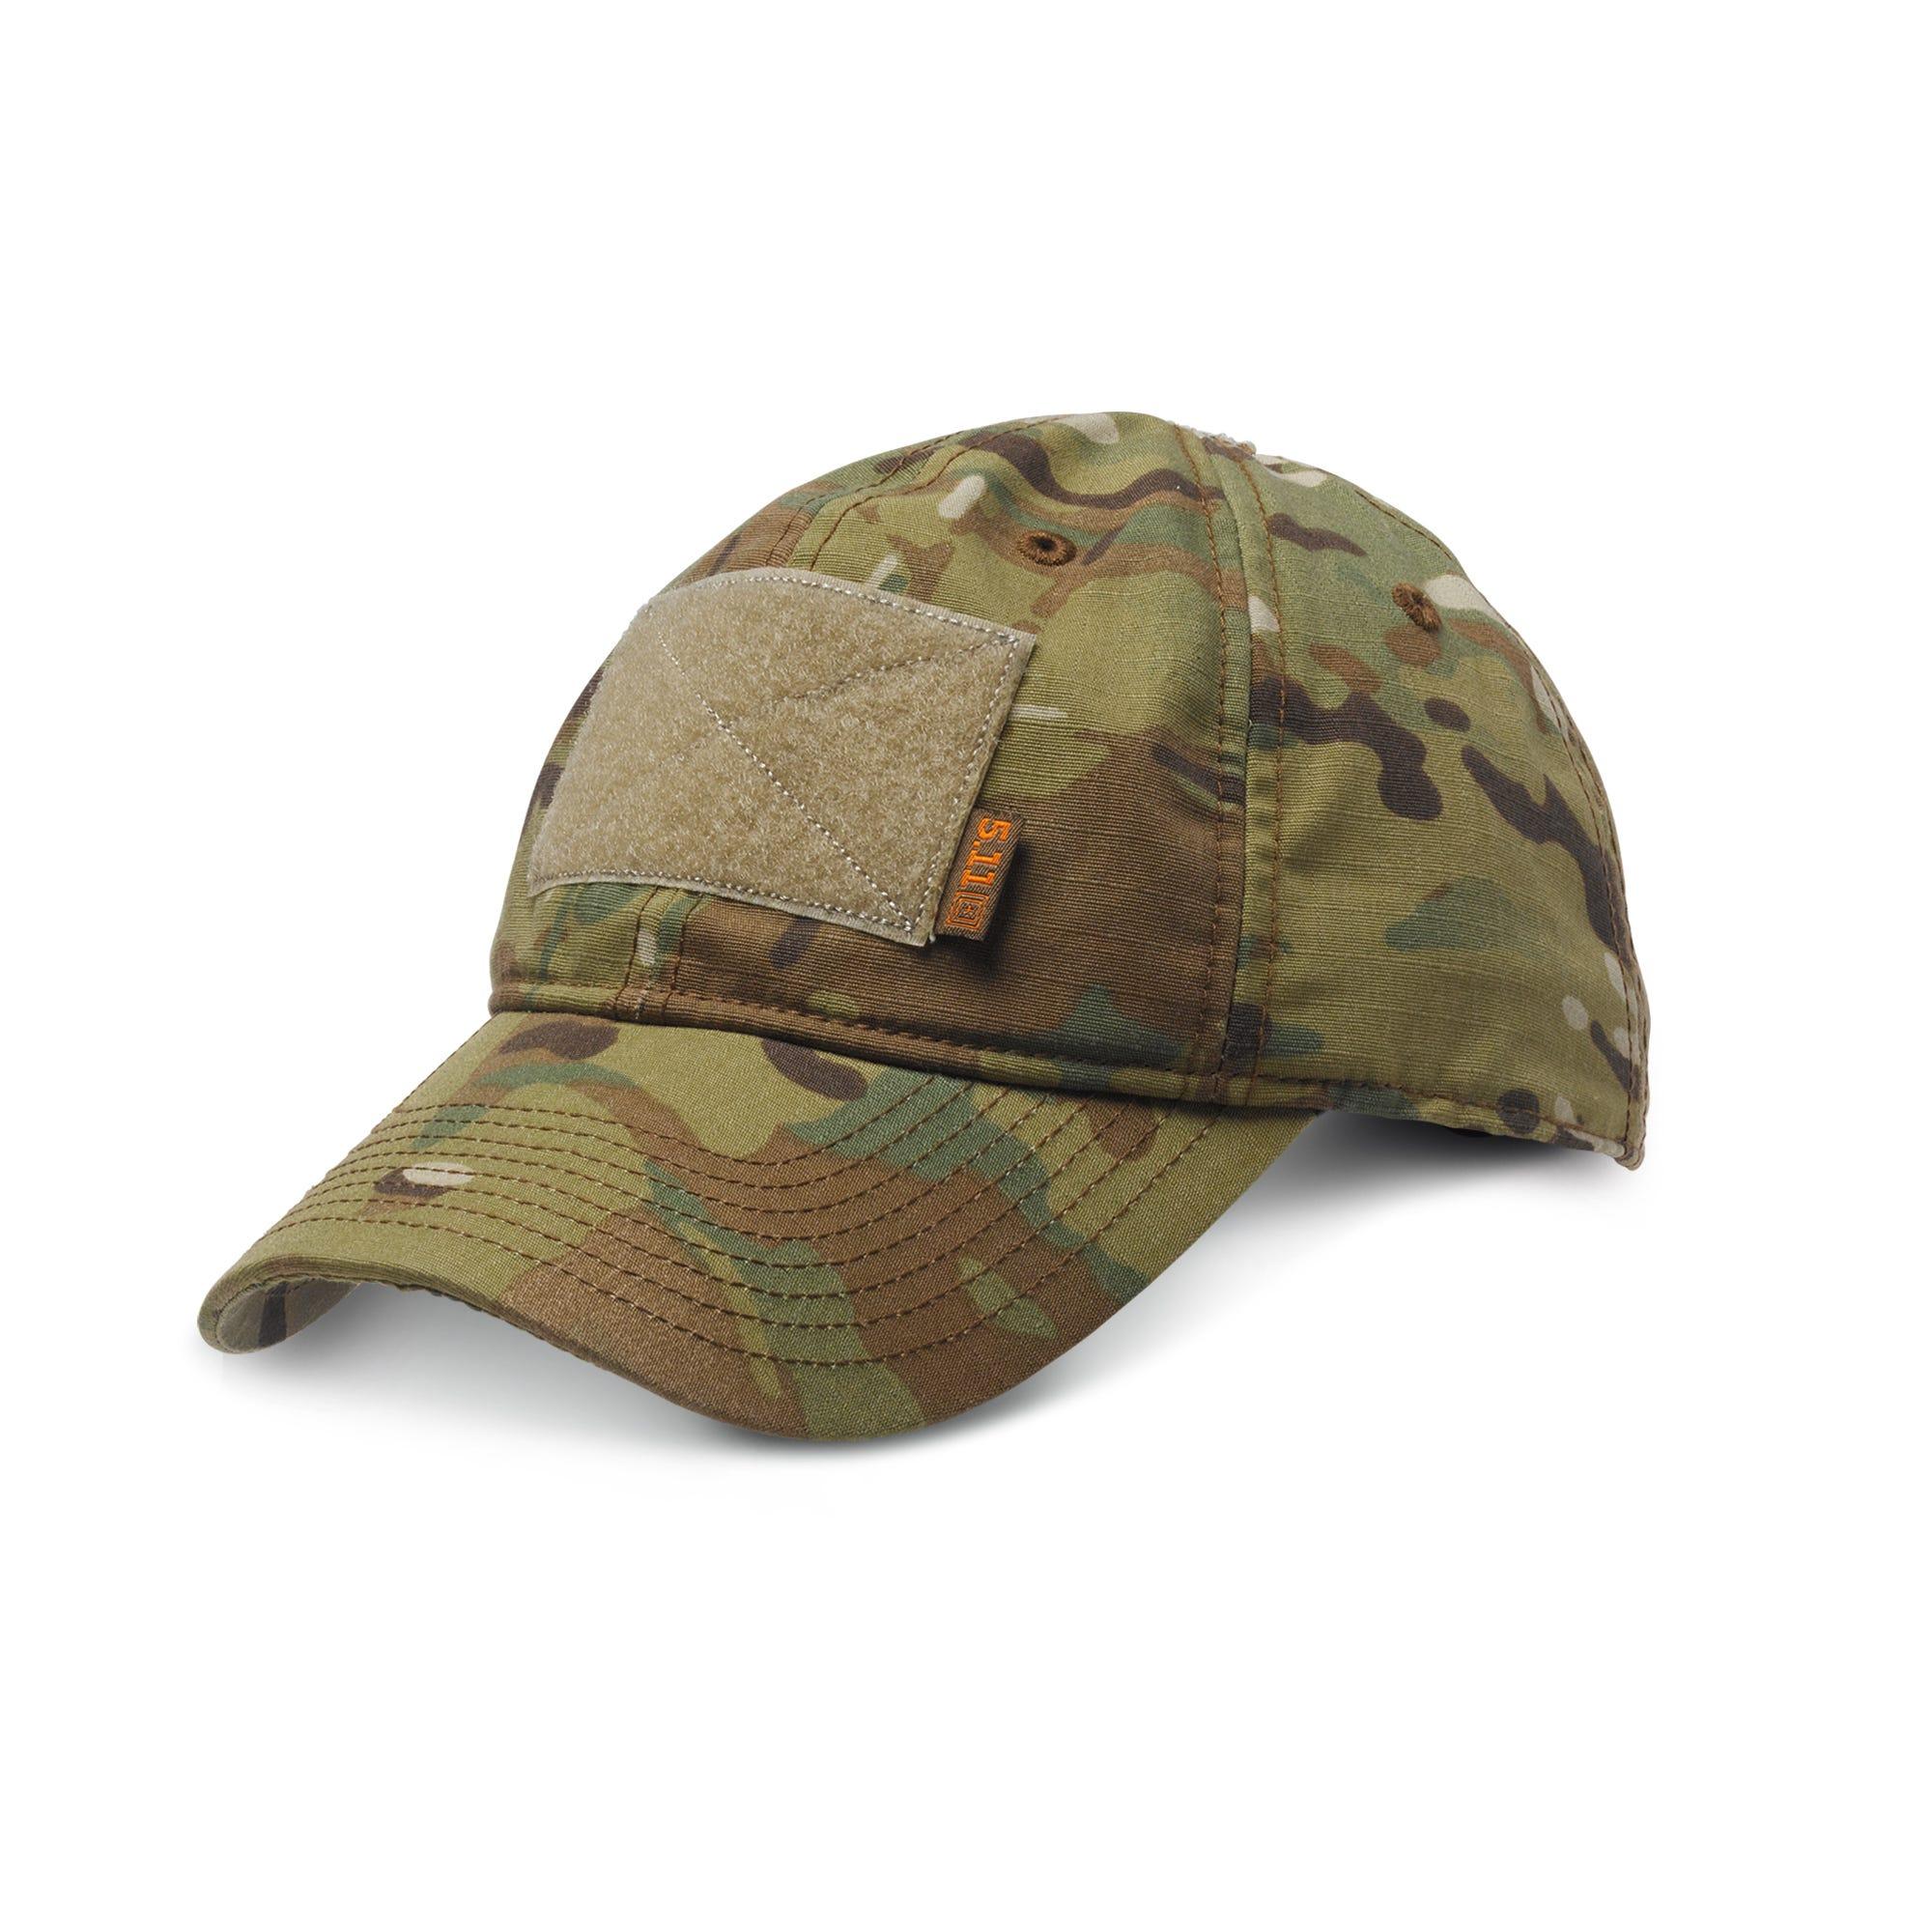 5.11 Tactical Men's MultiCam Flag Bearer Cap (Camo) thumbnail